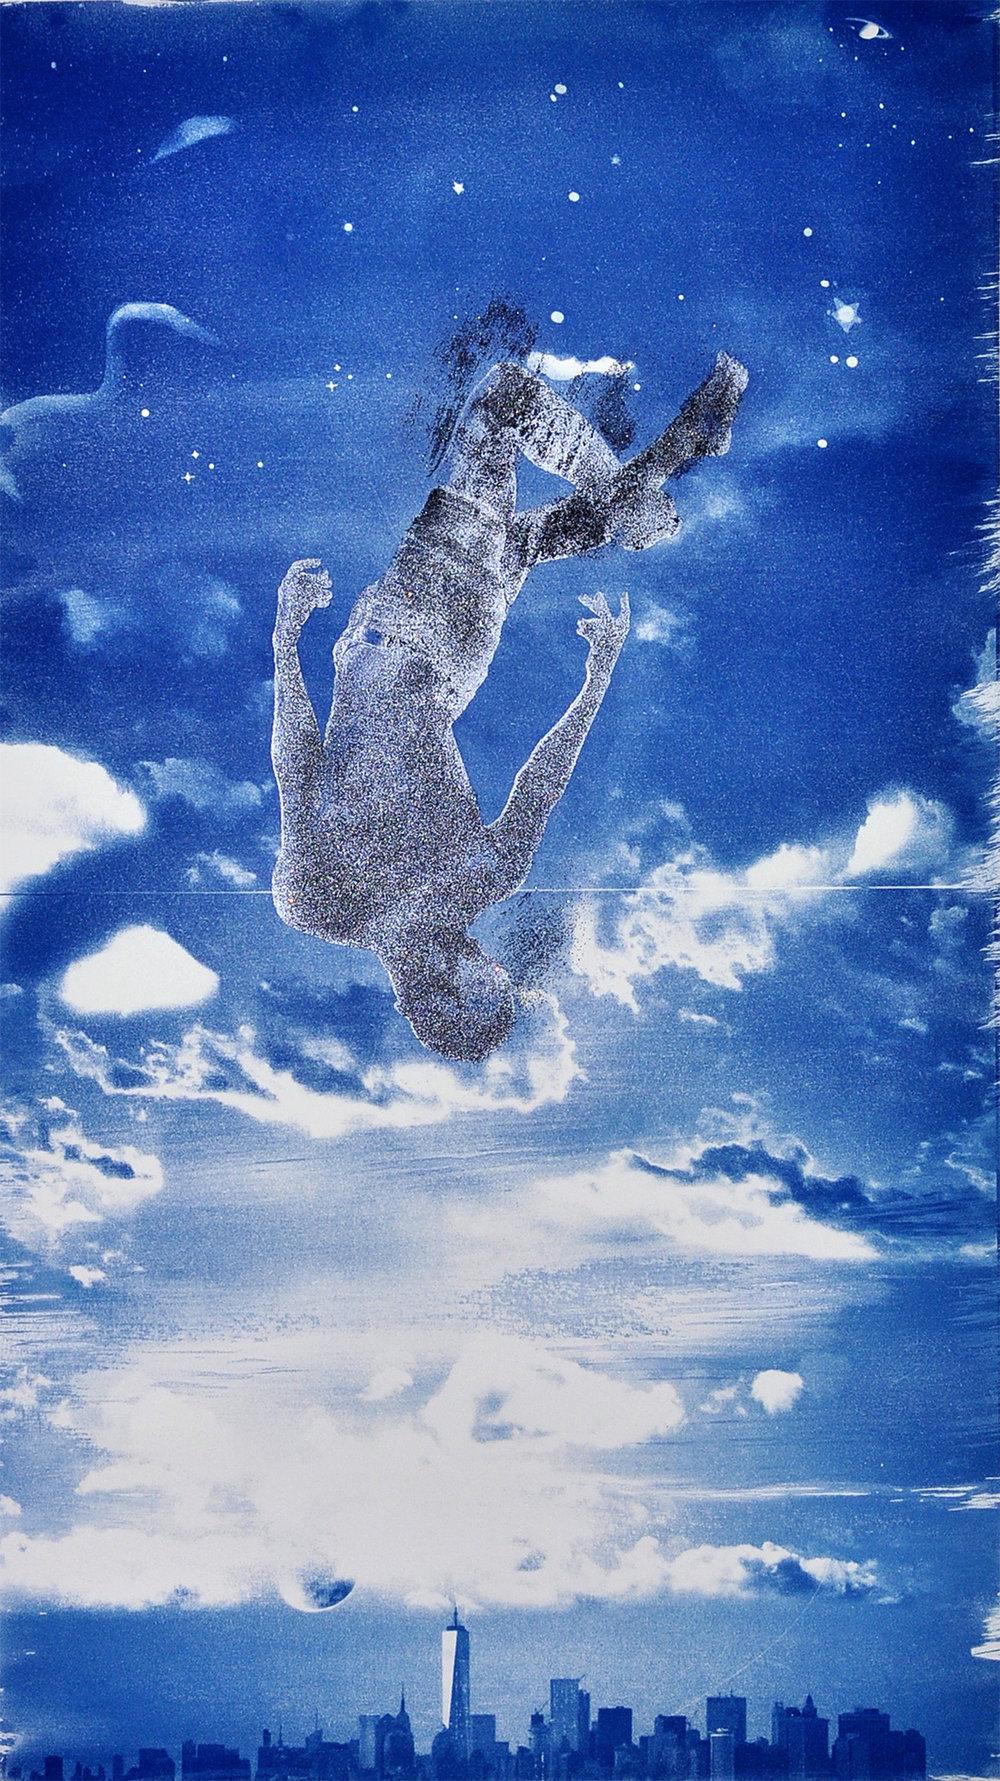 Ivan Forde  Birth of Enkidu, 2015  Courtesy Steven Kasher Gallery, New York